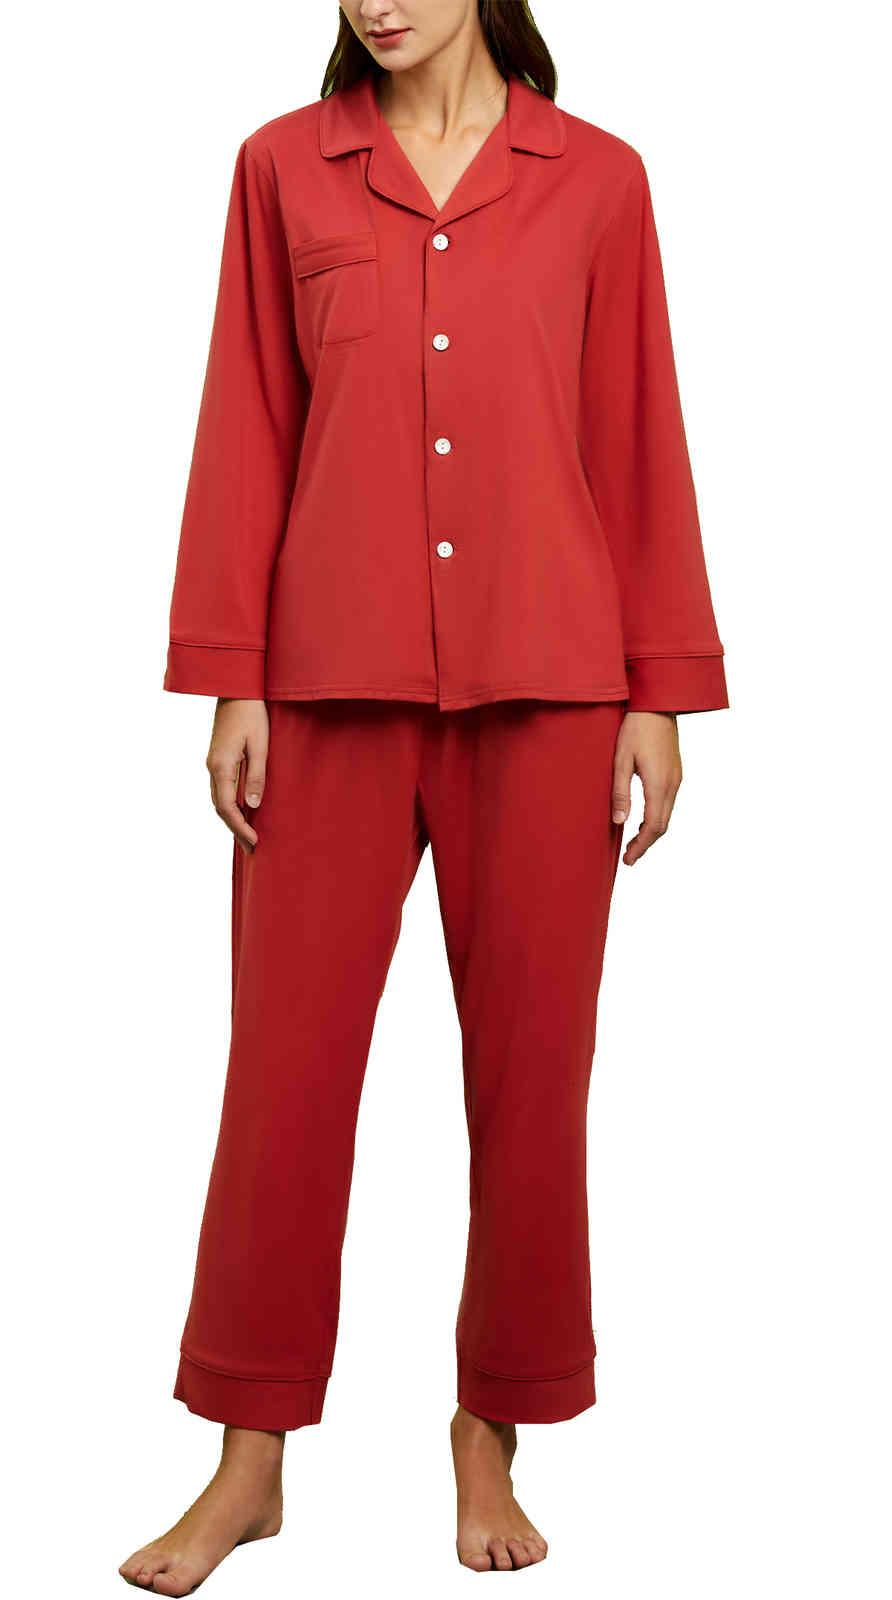 Femmes Coton Pyjamas Ensemble Classic Manches Longues Bouton Down Wightwear Nightwear Nightwear Dames Retro V ecoux Loungewear PJS 2 pièces